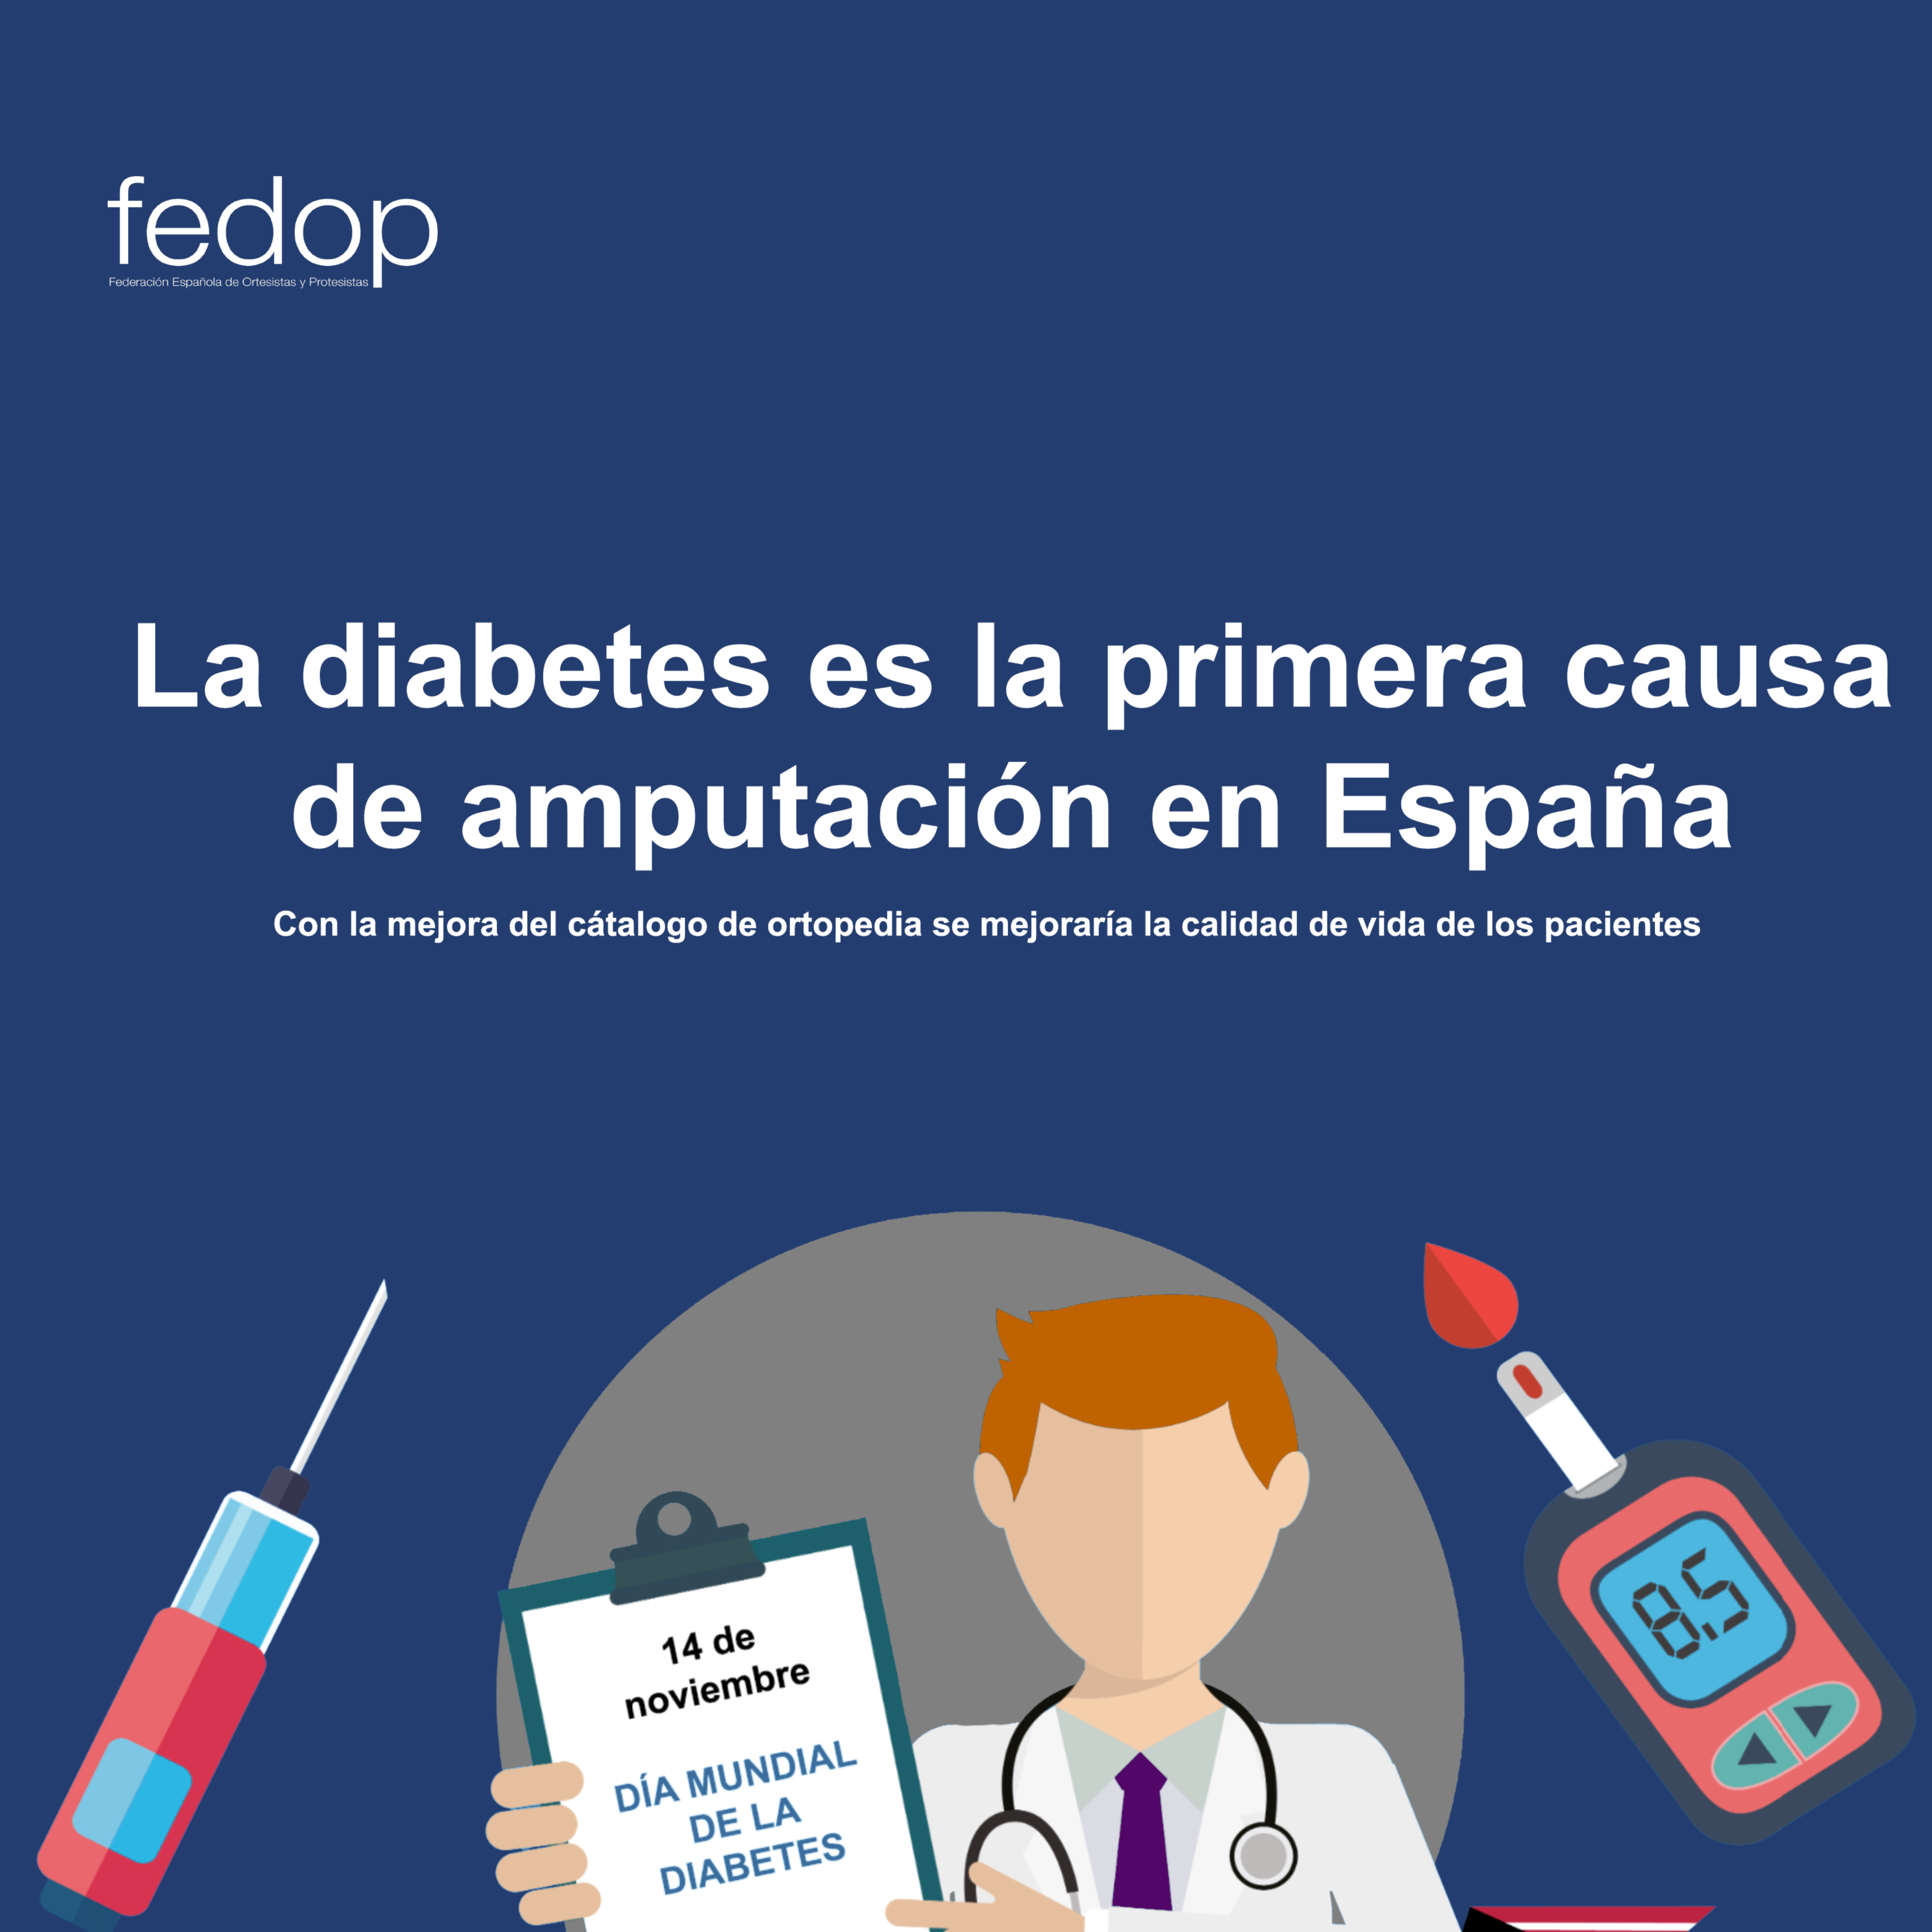 makaronat dhe tratamiento de la diabetes